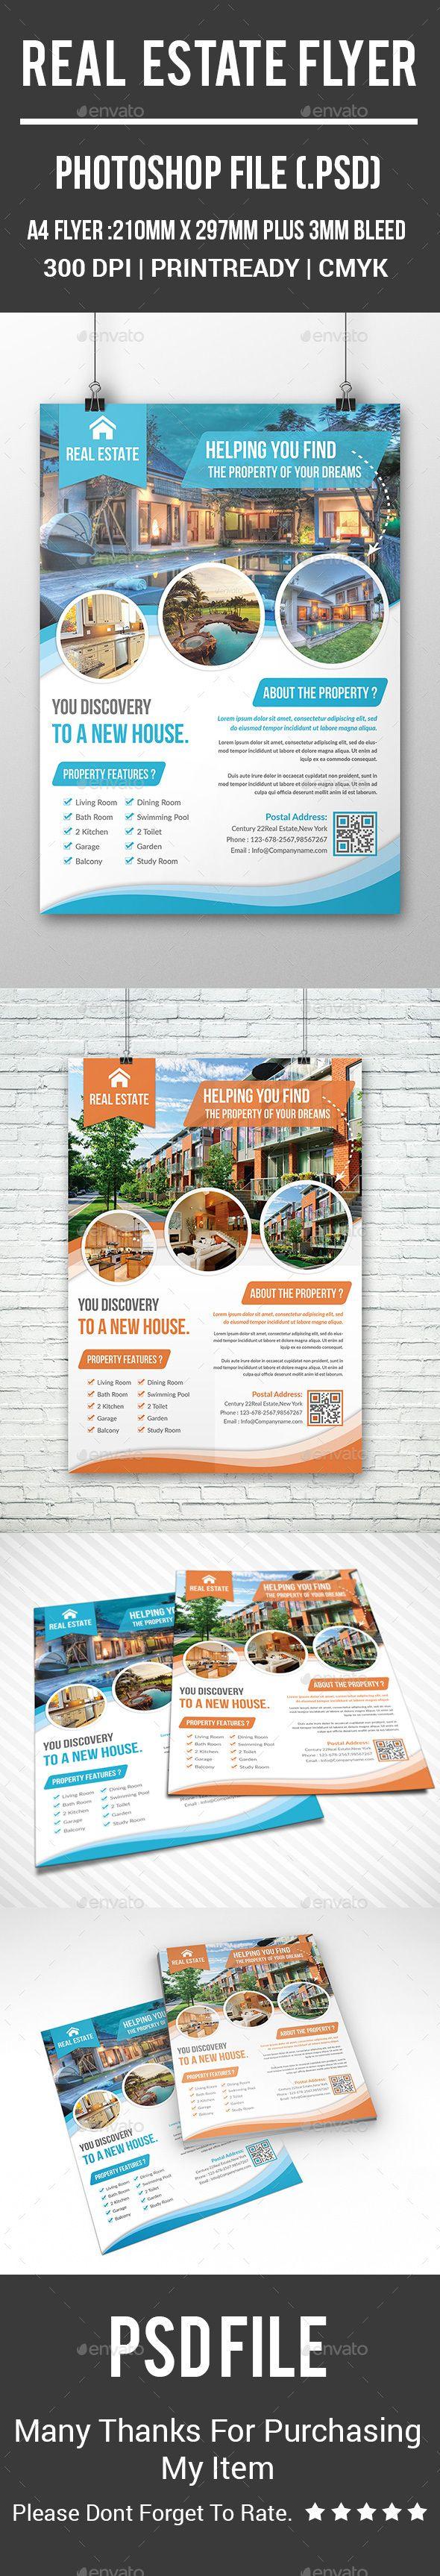 Real Estate Flyer Template PSD. Download here: http://graphicriver.net/item/real-estate-flyer/16078958?ref=ksioks